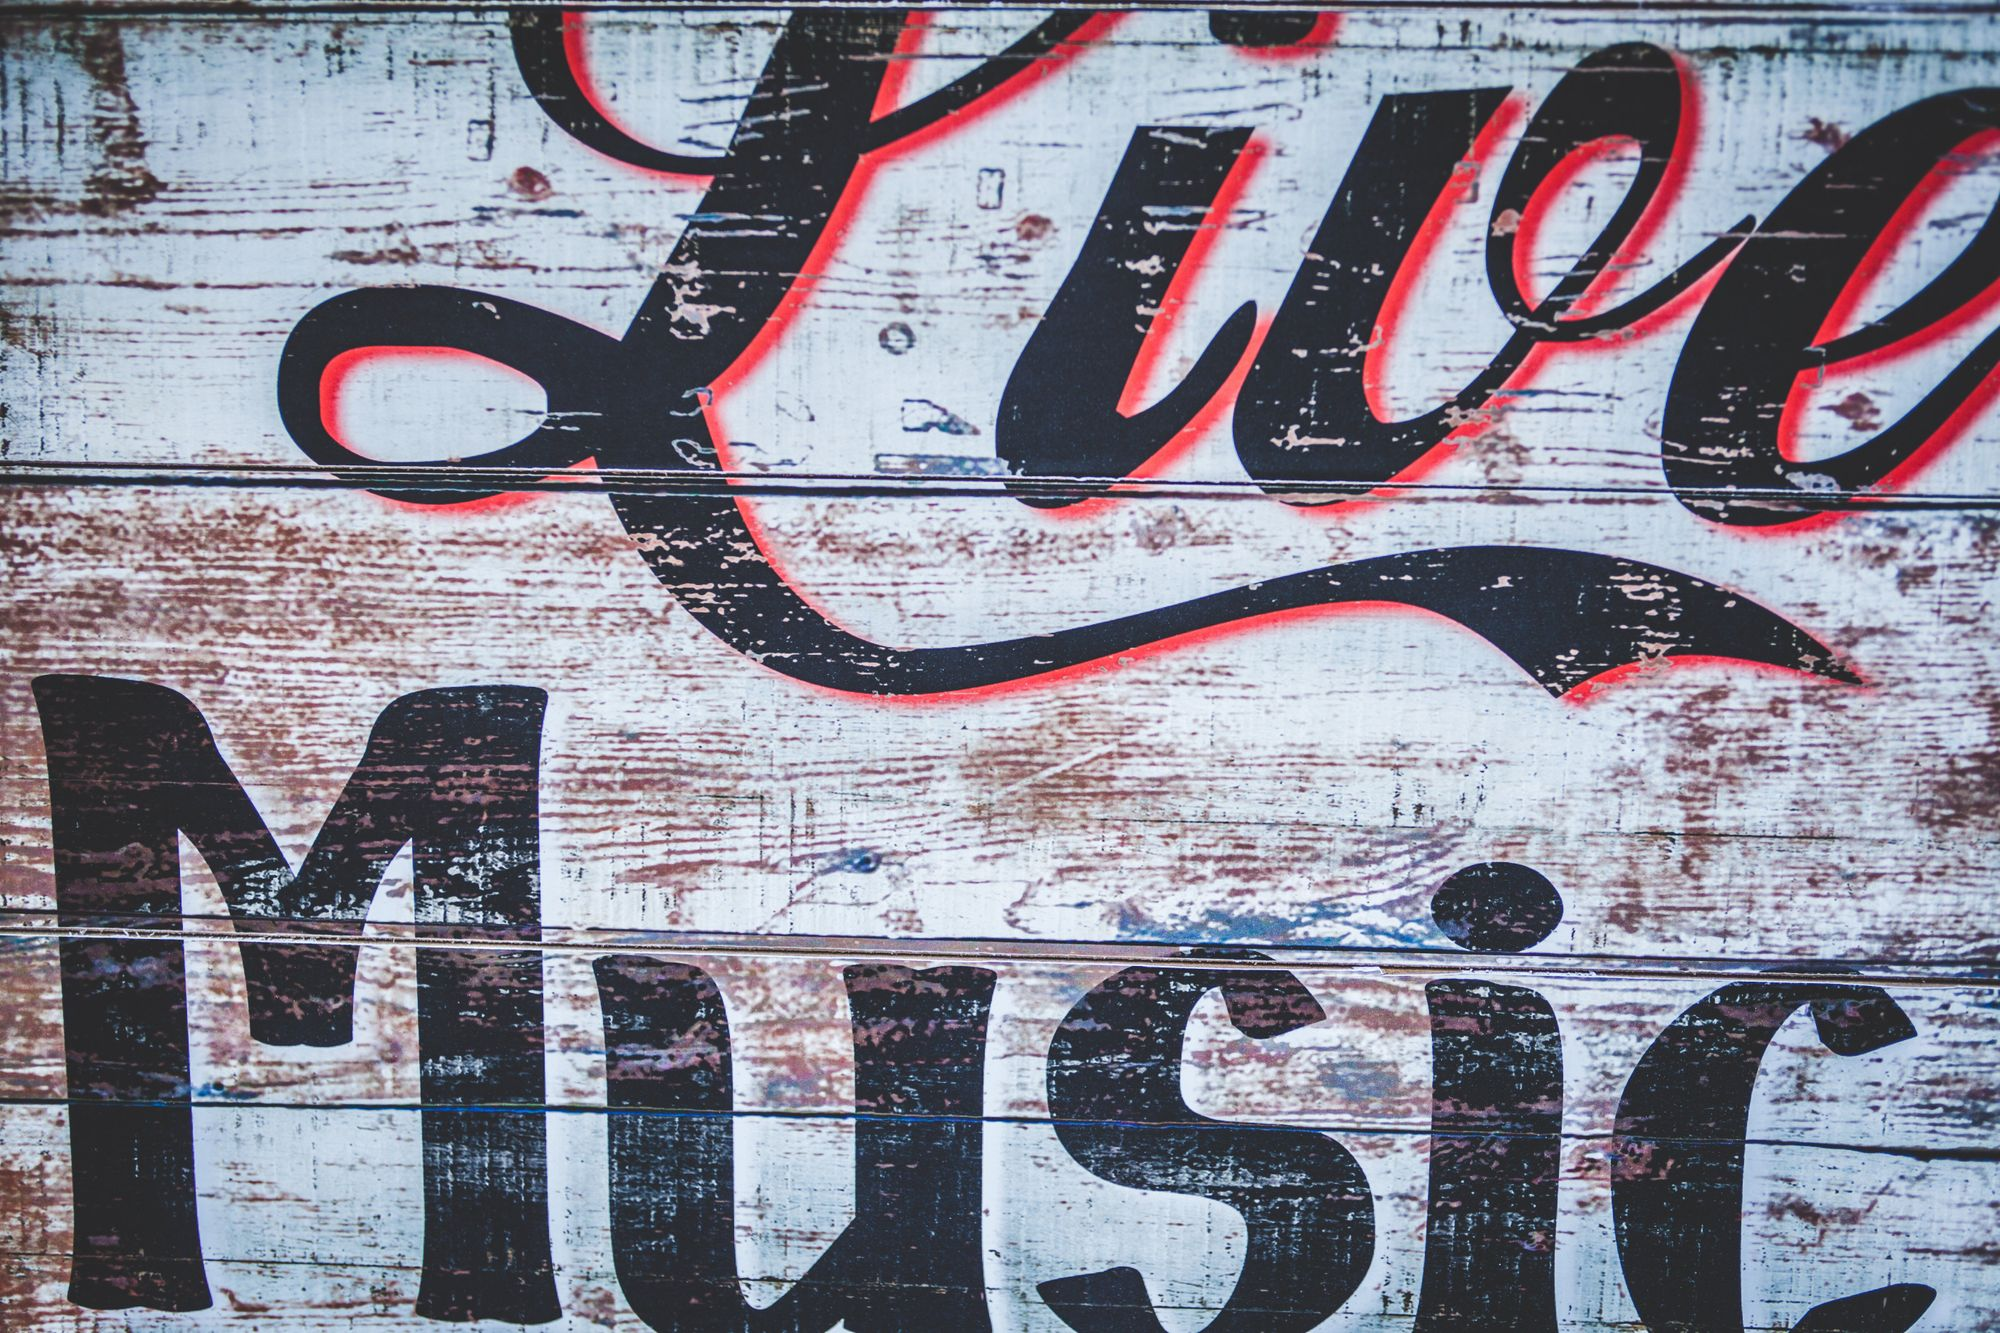 Exploration Weekly - SoundCloud Unveils New Distribution